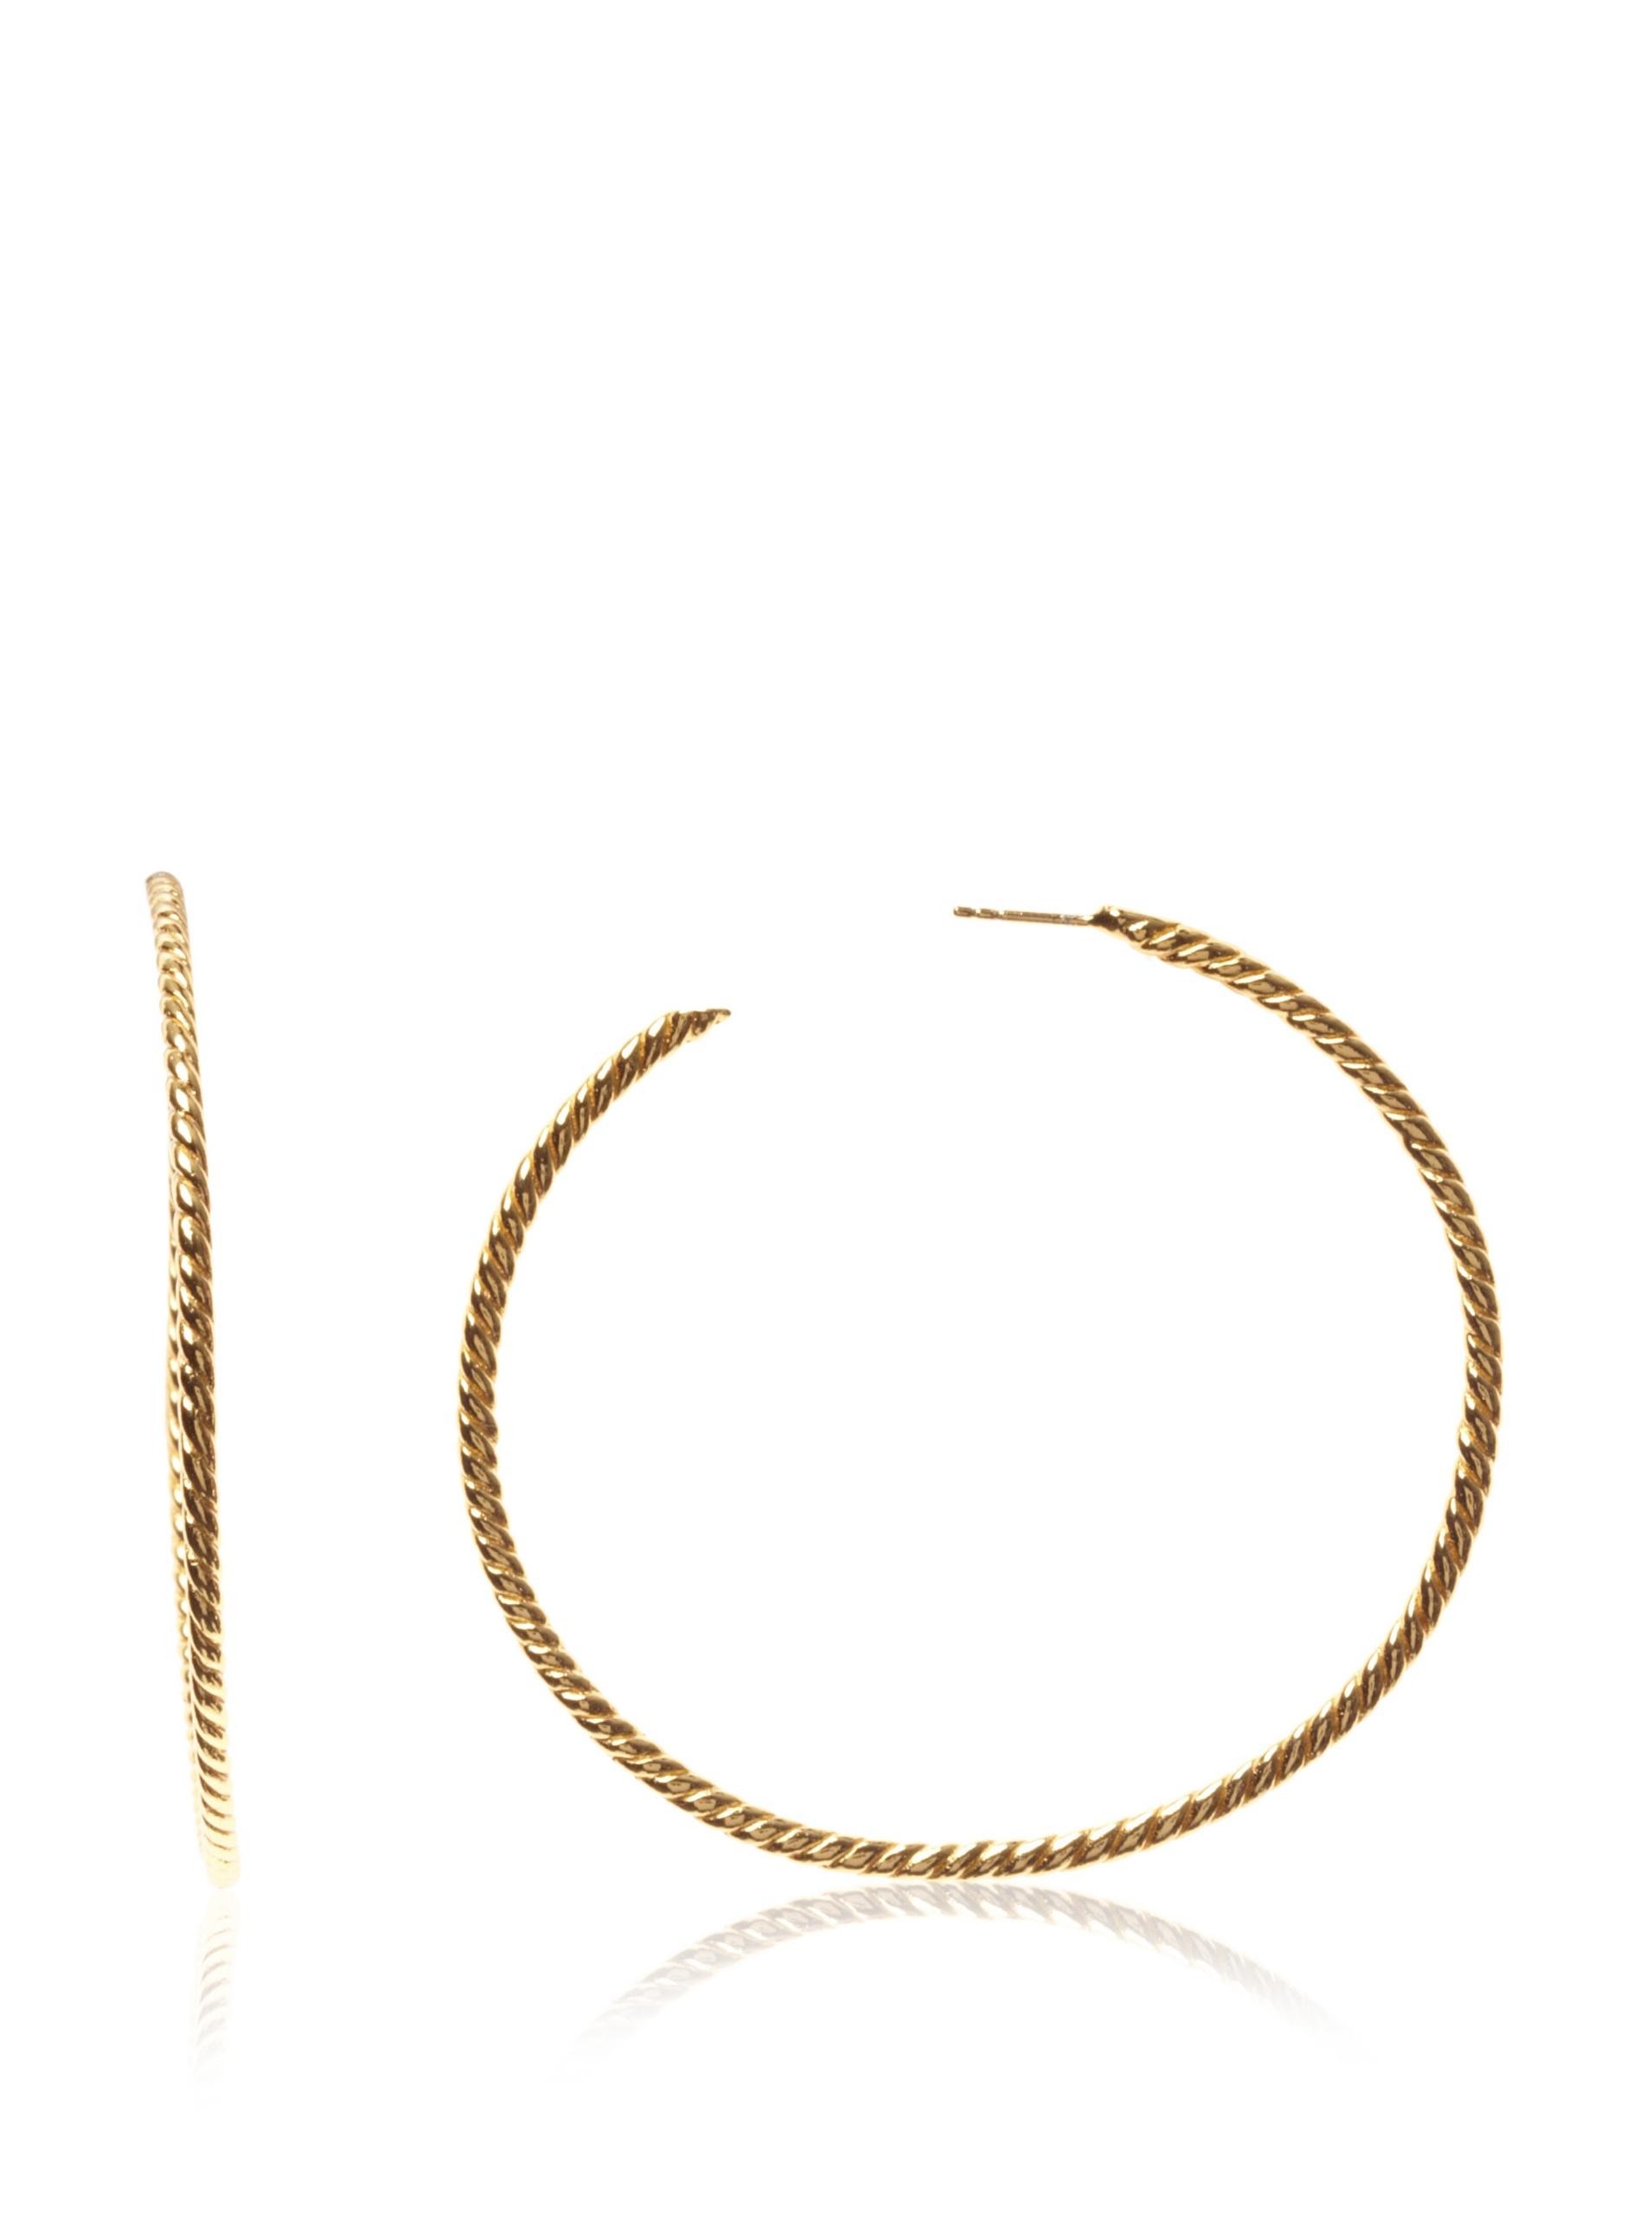 gorjana Rope Hoops, Gold